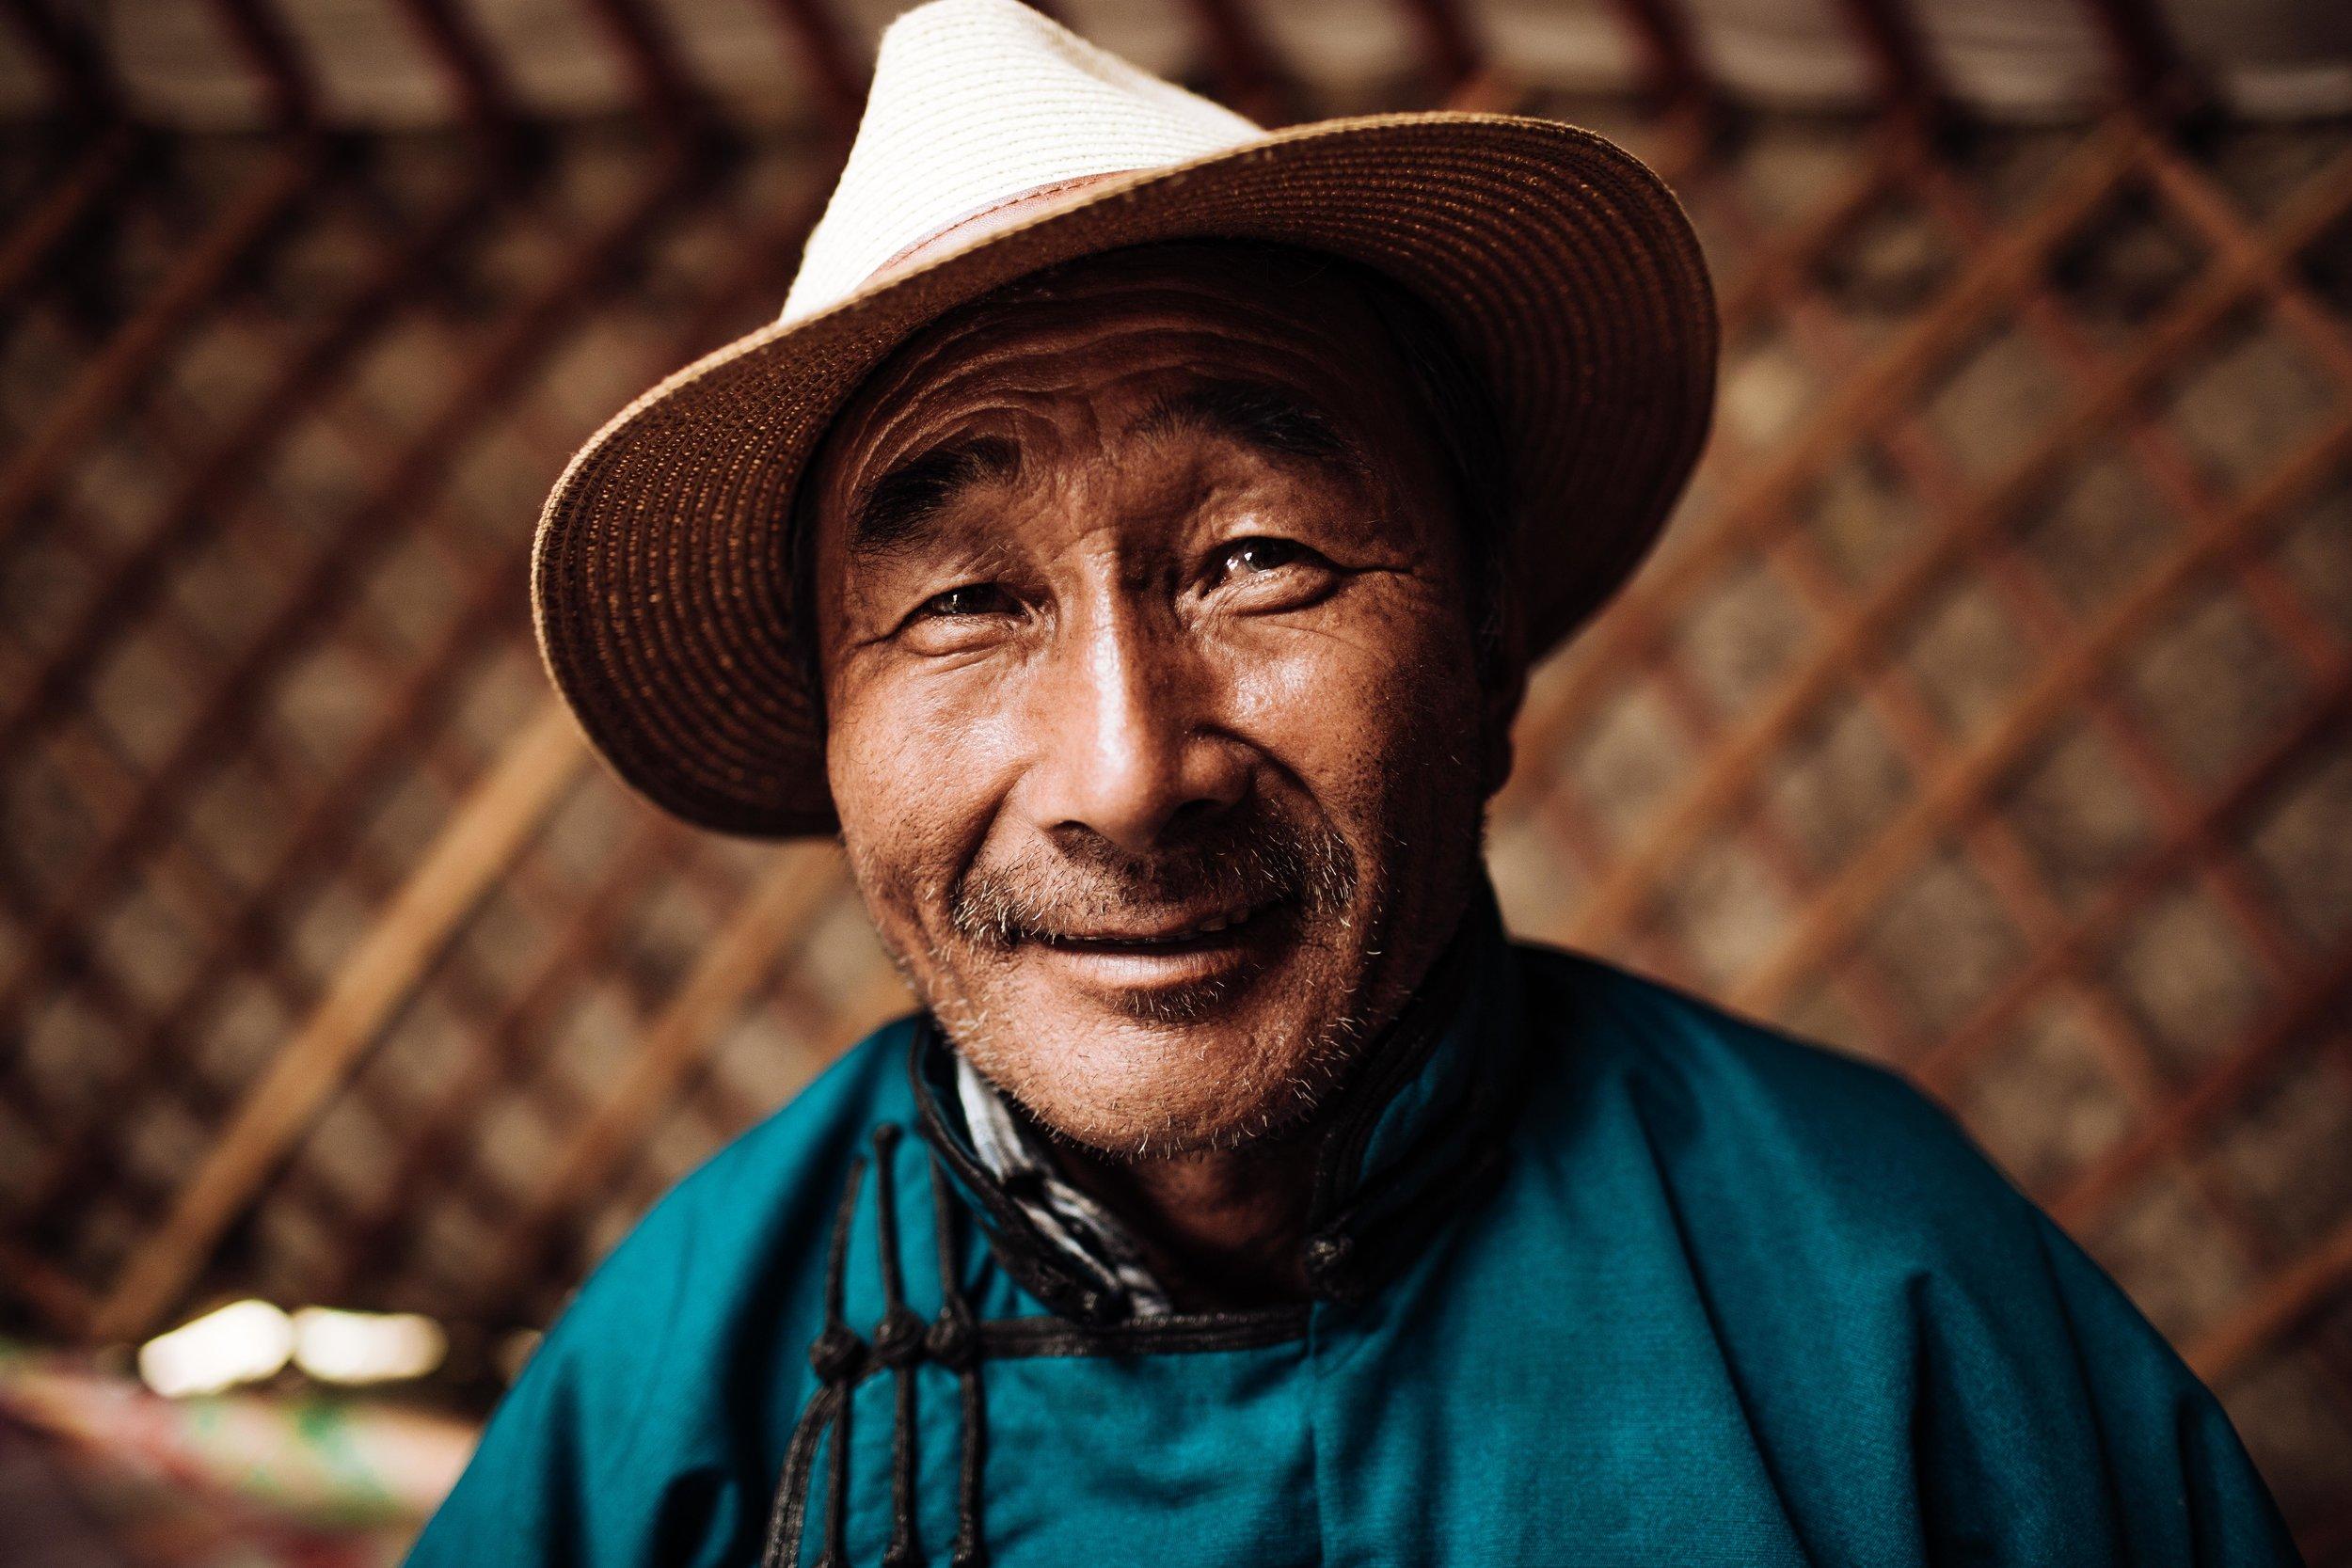 Mongolia_day6_0798.jpg